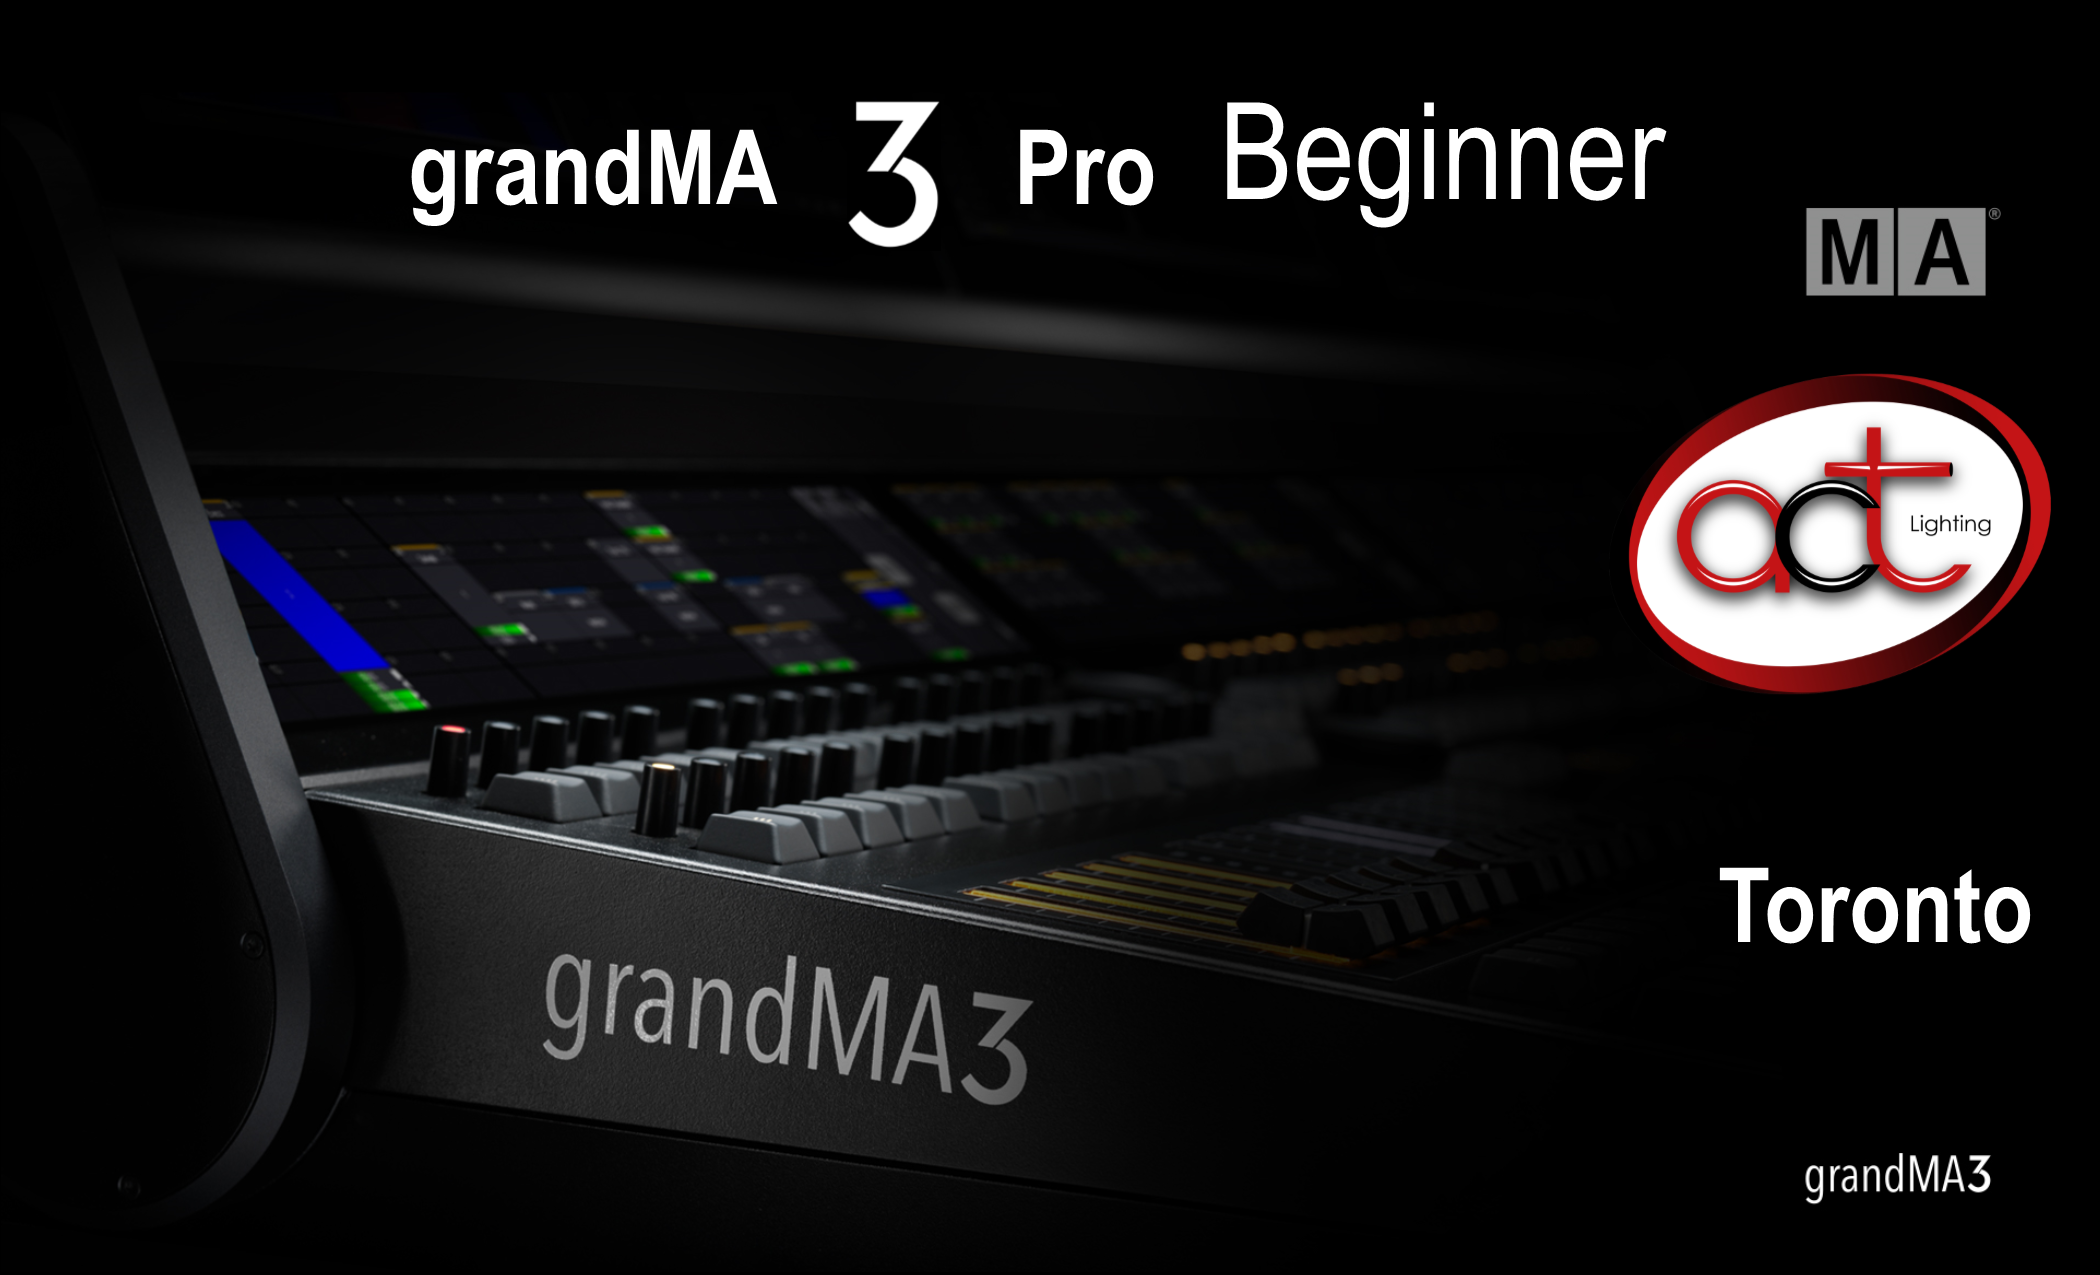 grandMA3 Pro Beginner - Toronto